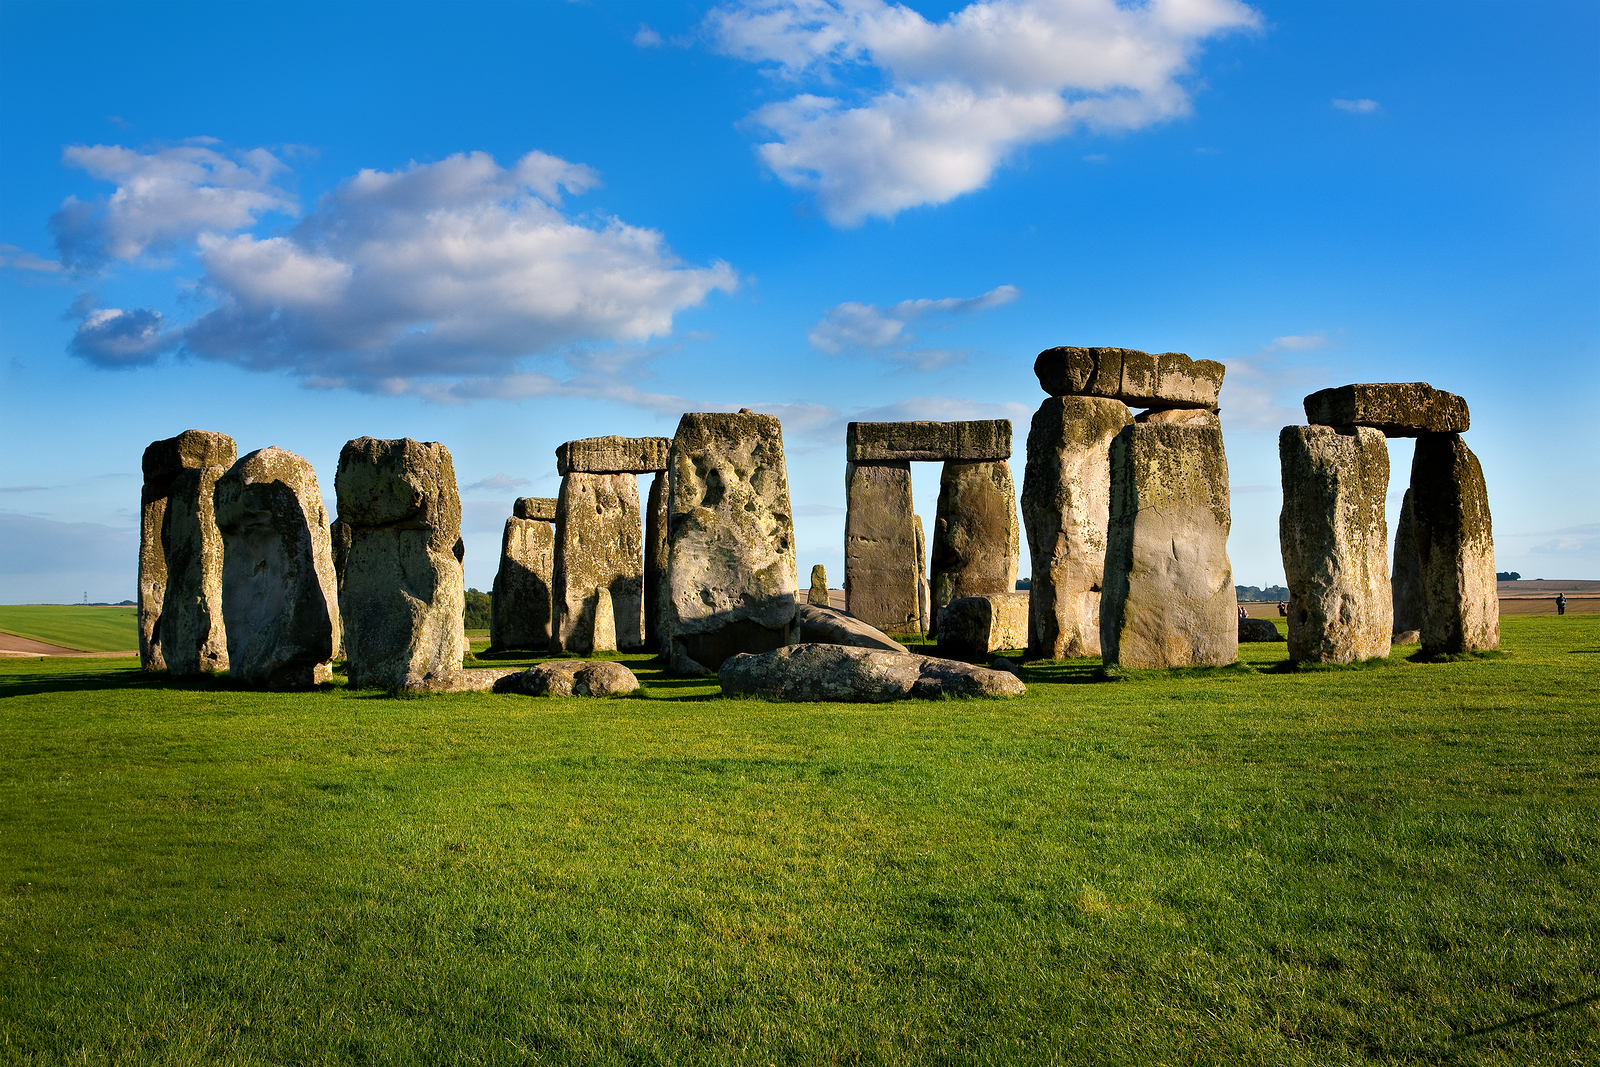 Famous Rock Group, Stonehenge, Wiltshire, England  № 715539 бесплатно